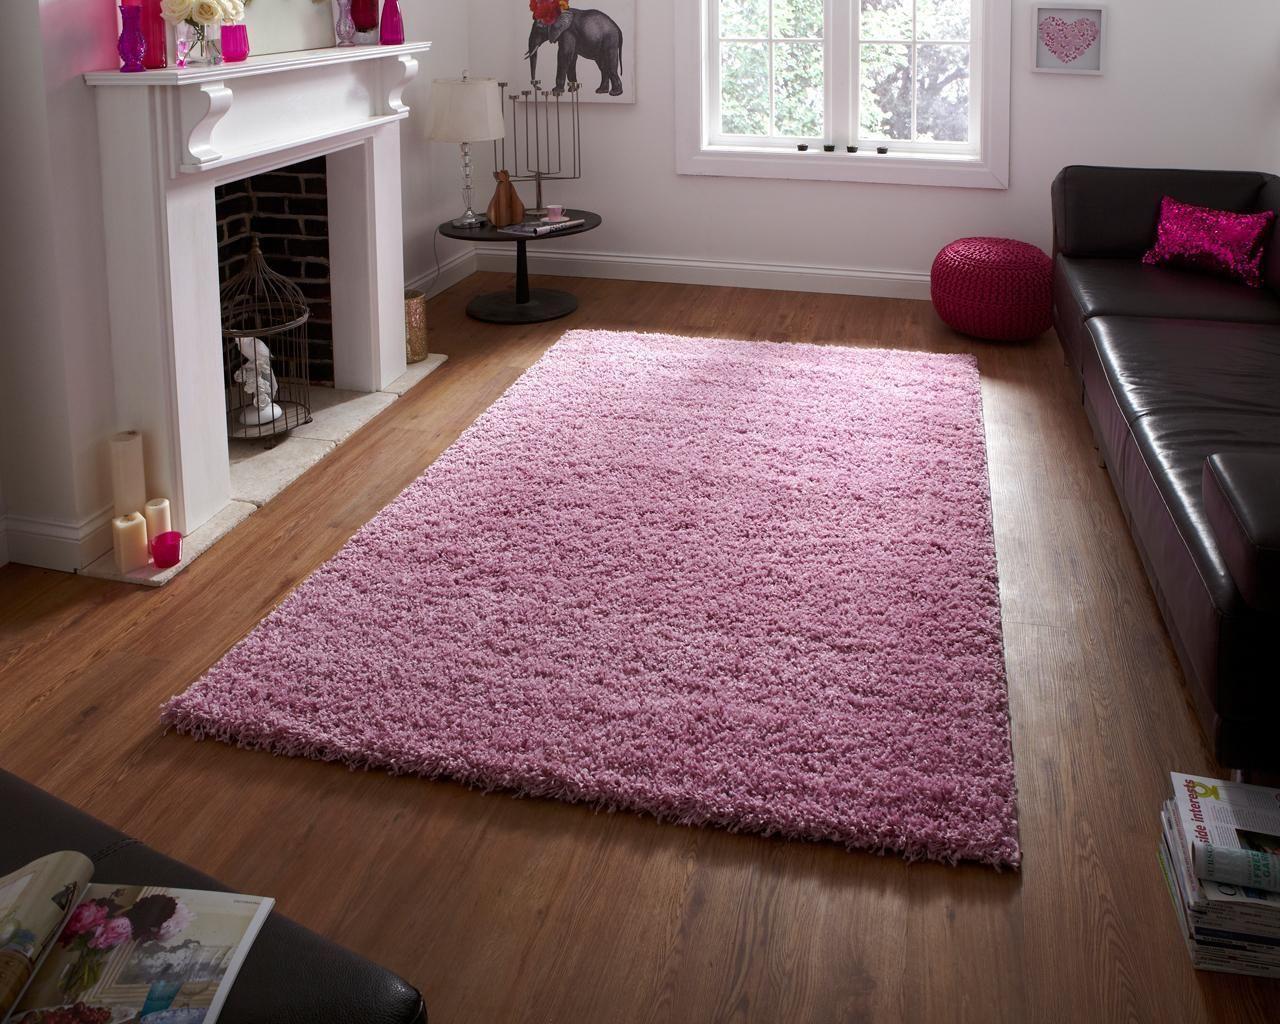 Covor Vista Pink 160x220 cm vivre.ro